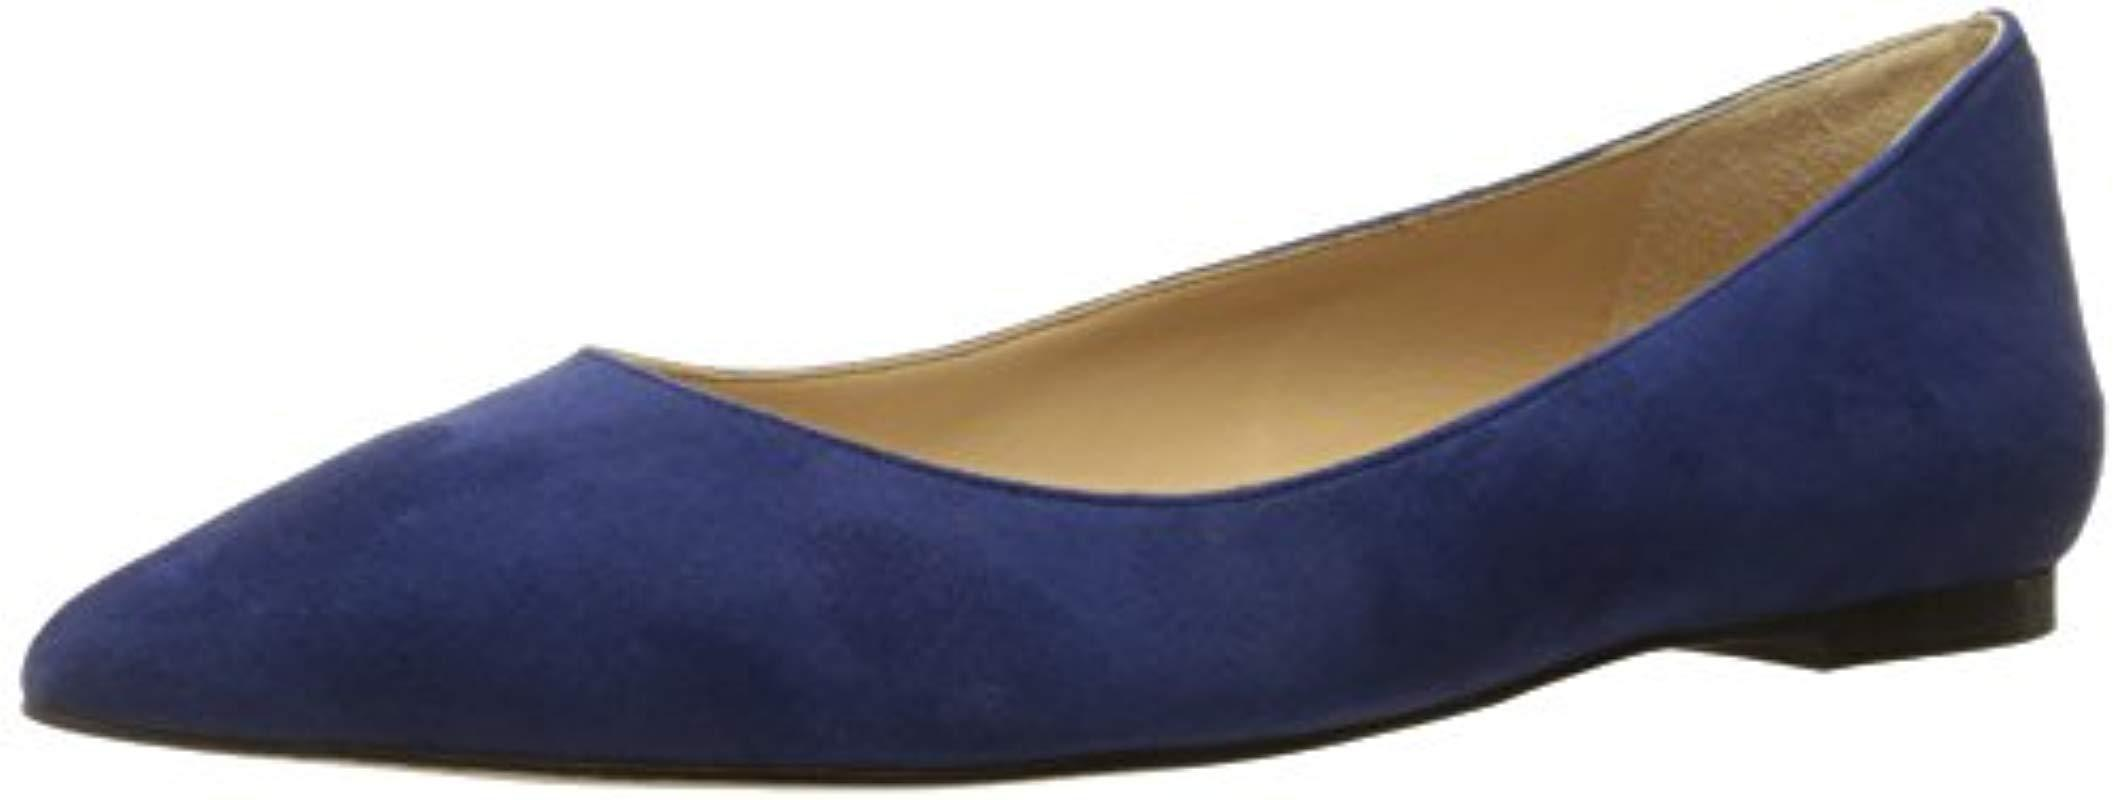 a83014912725 Lyst - Sam Edelman Rae Pointed Toe Flat in Blue - Save ...